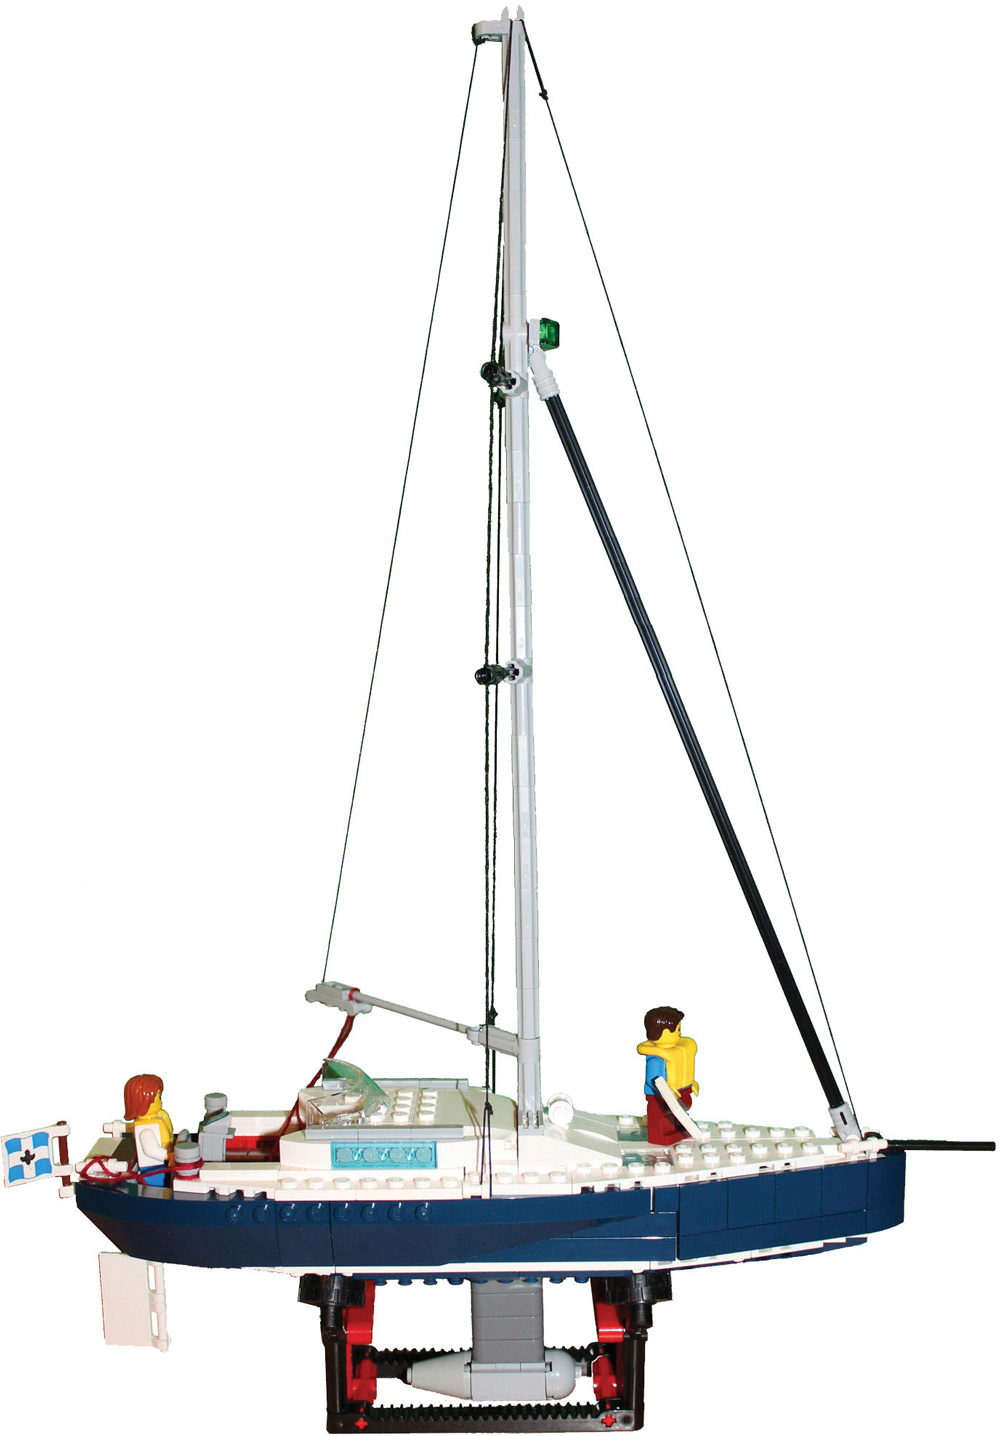 Lego my boat kit